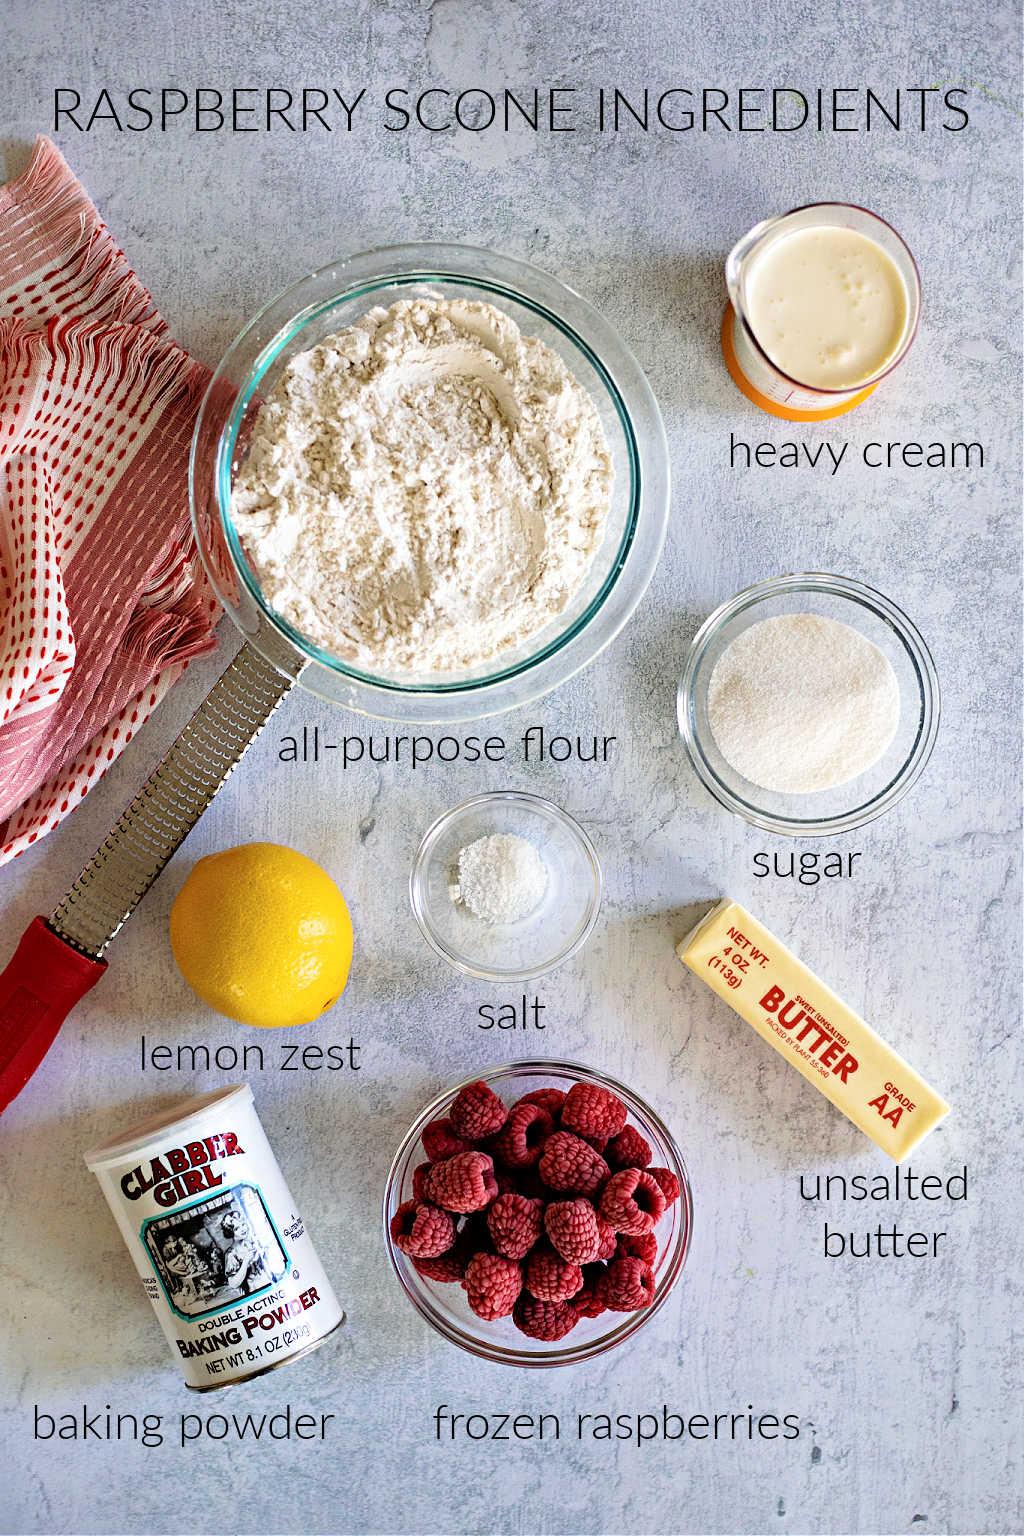 ingredients for raspberry scones